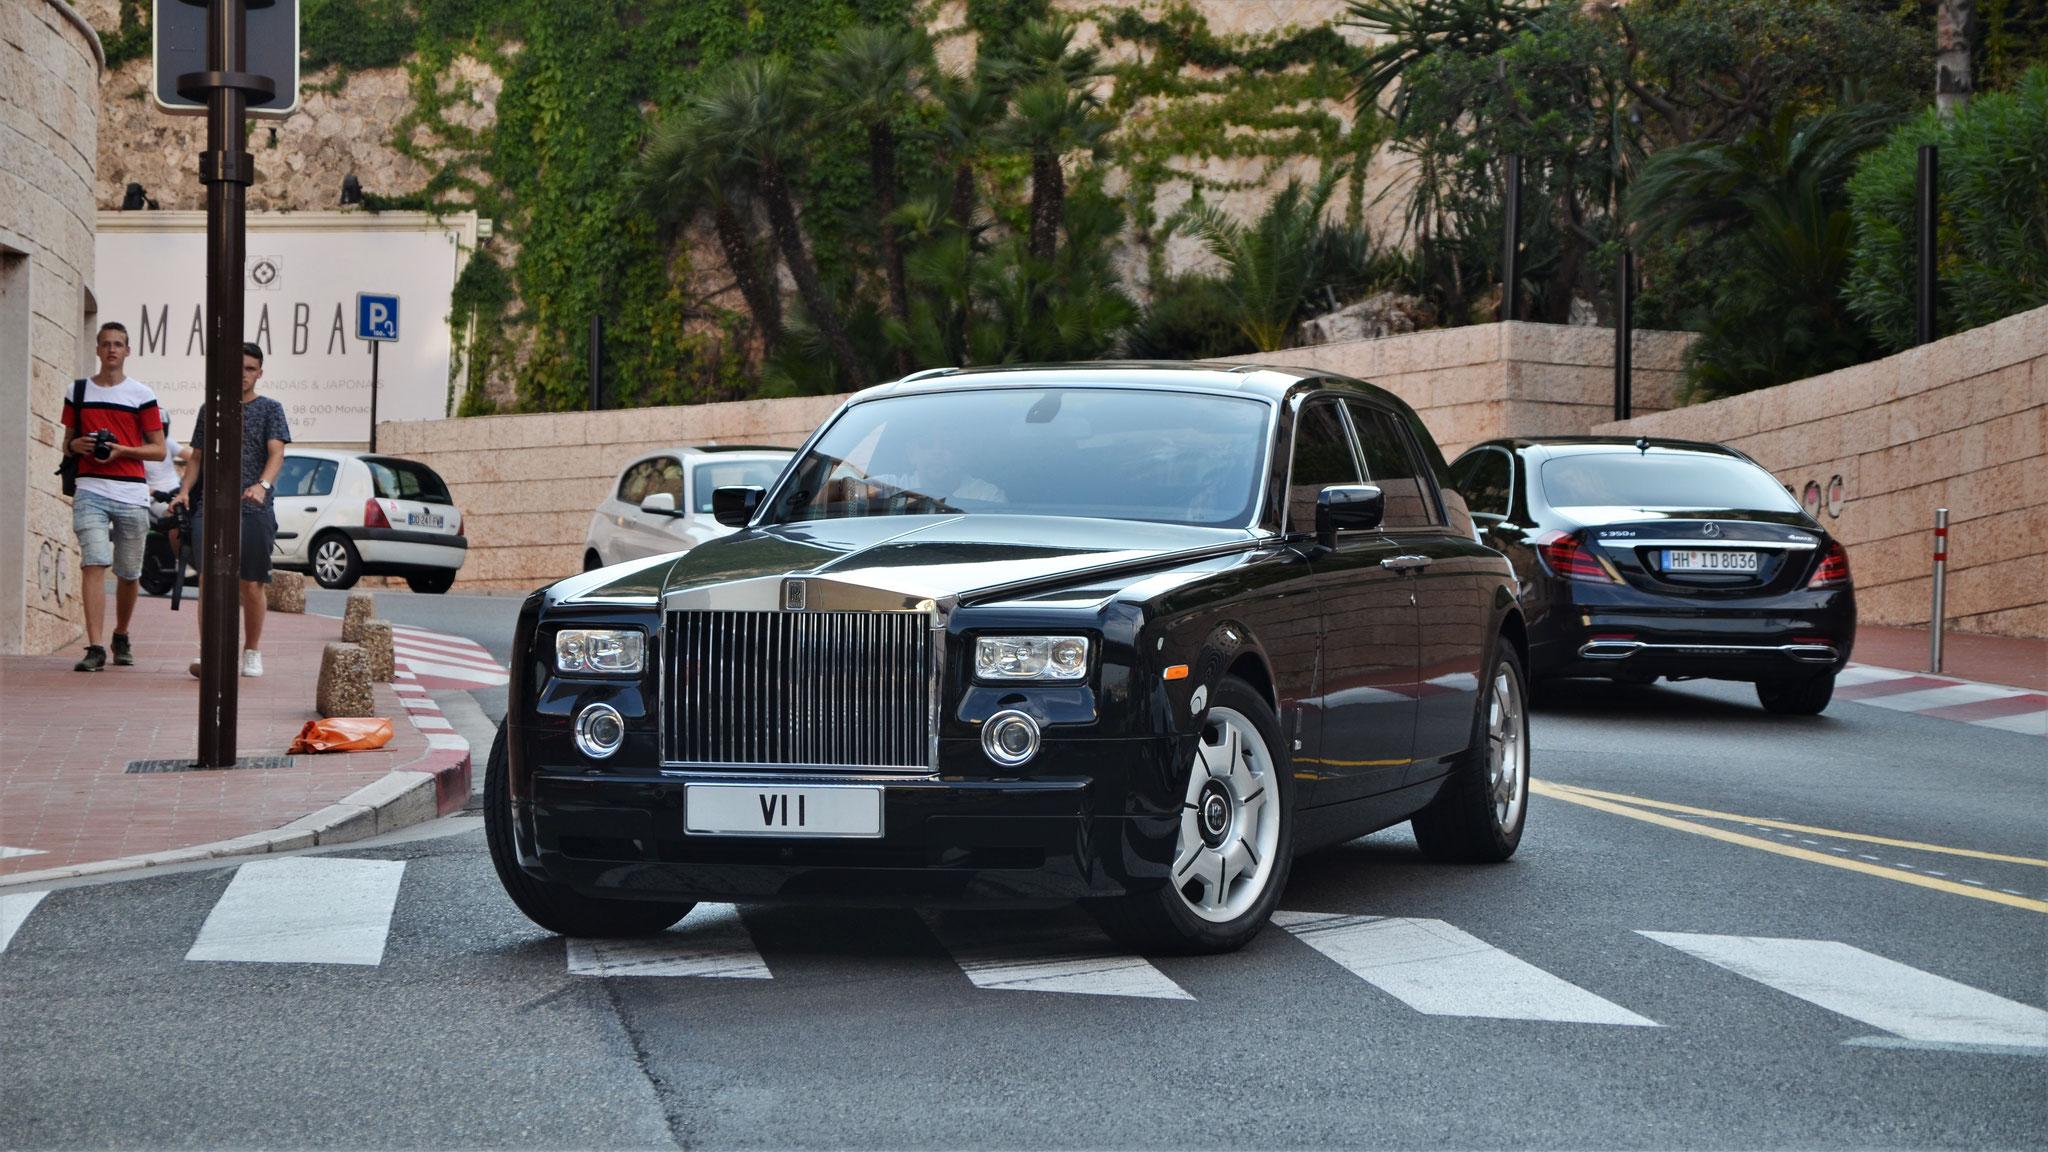 Rolls Royce Phantom - V11 (GB)